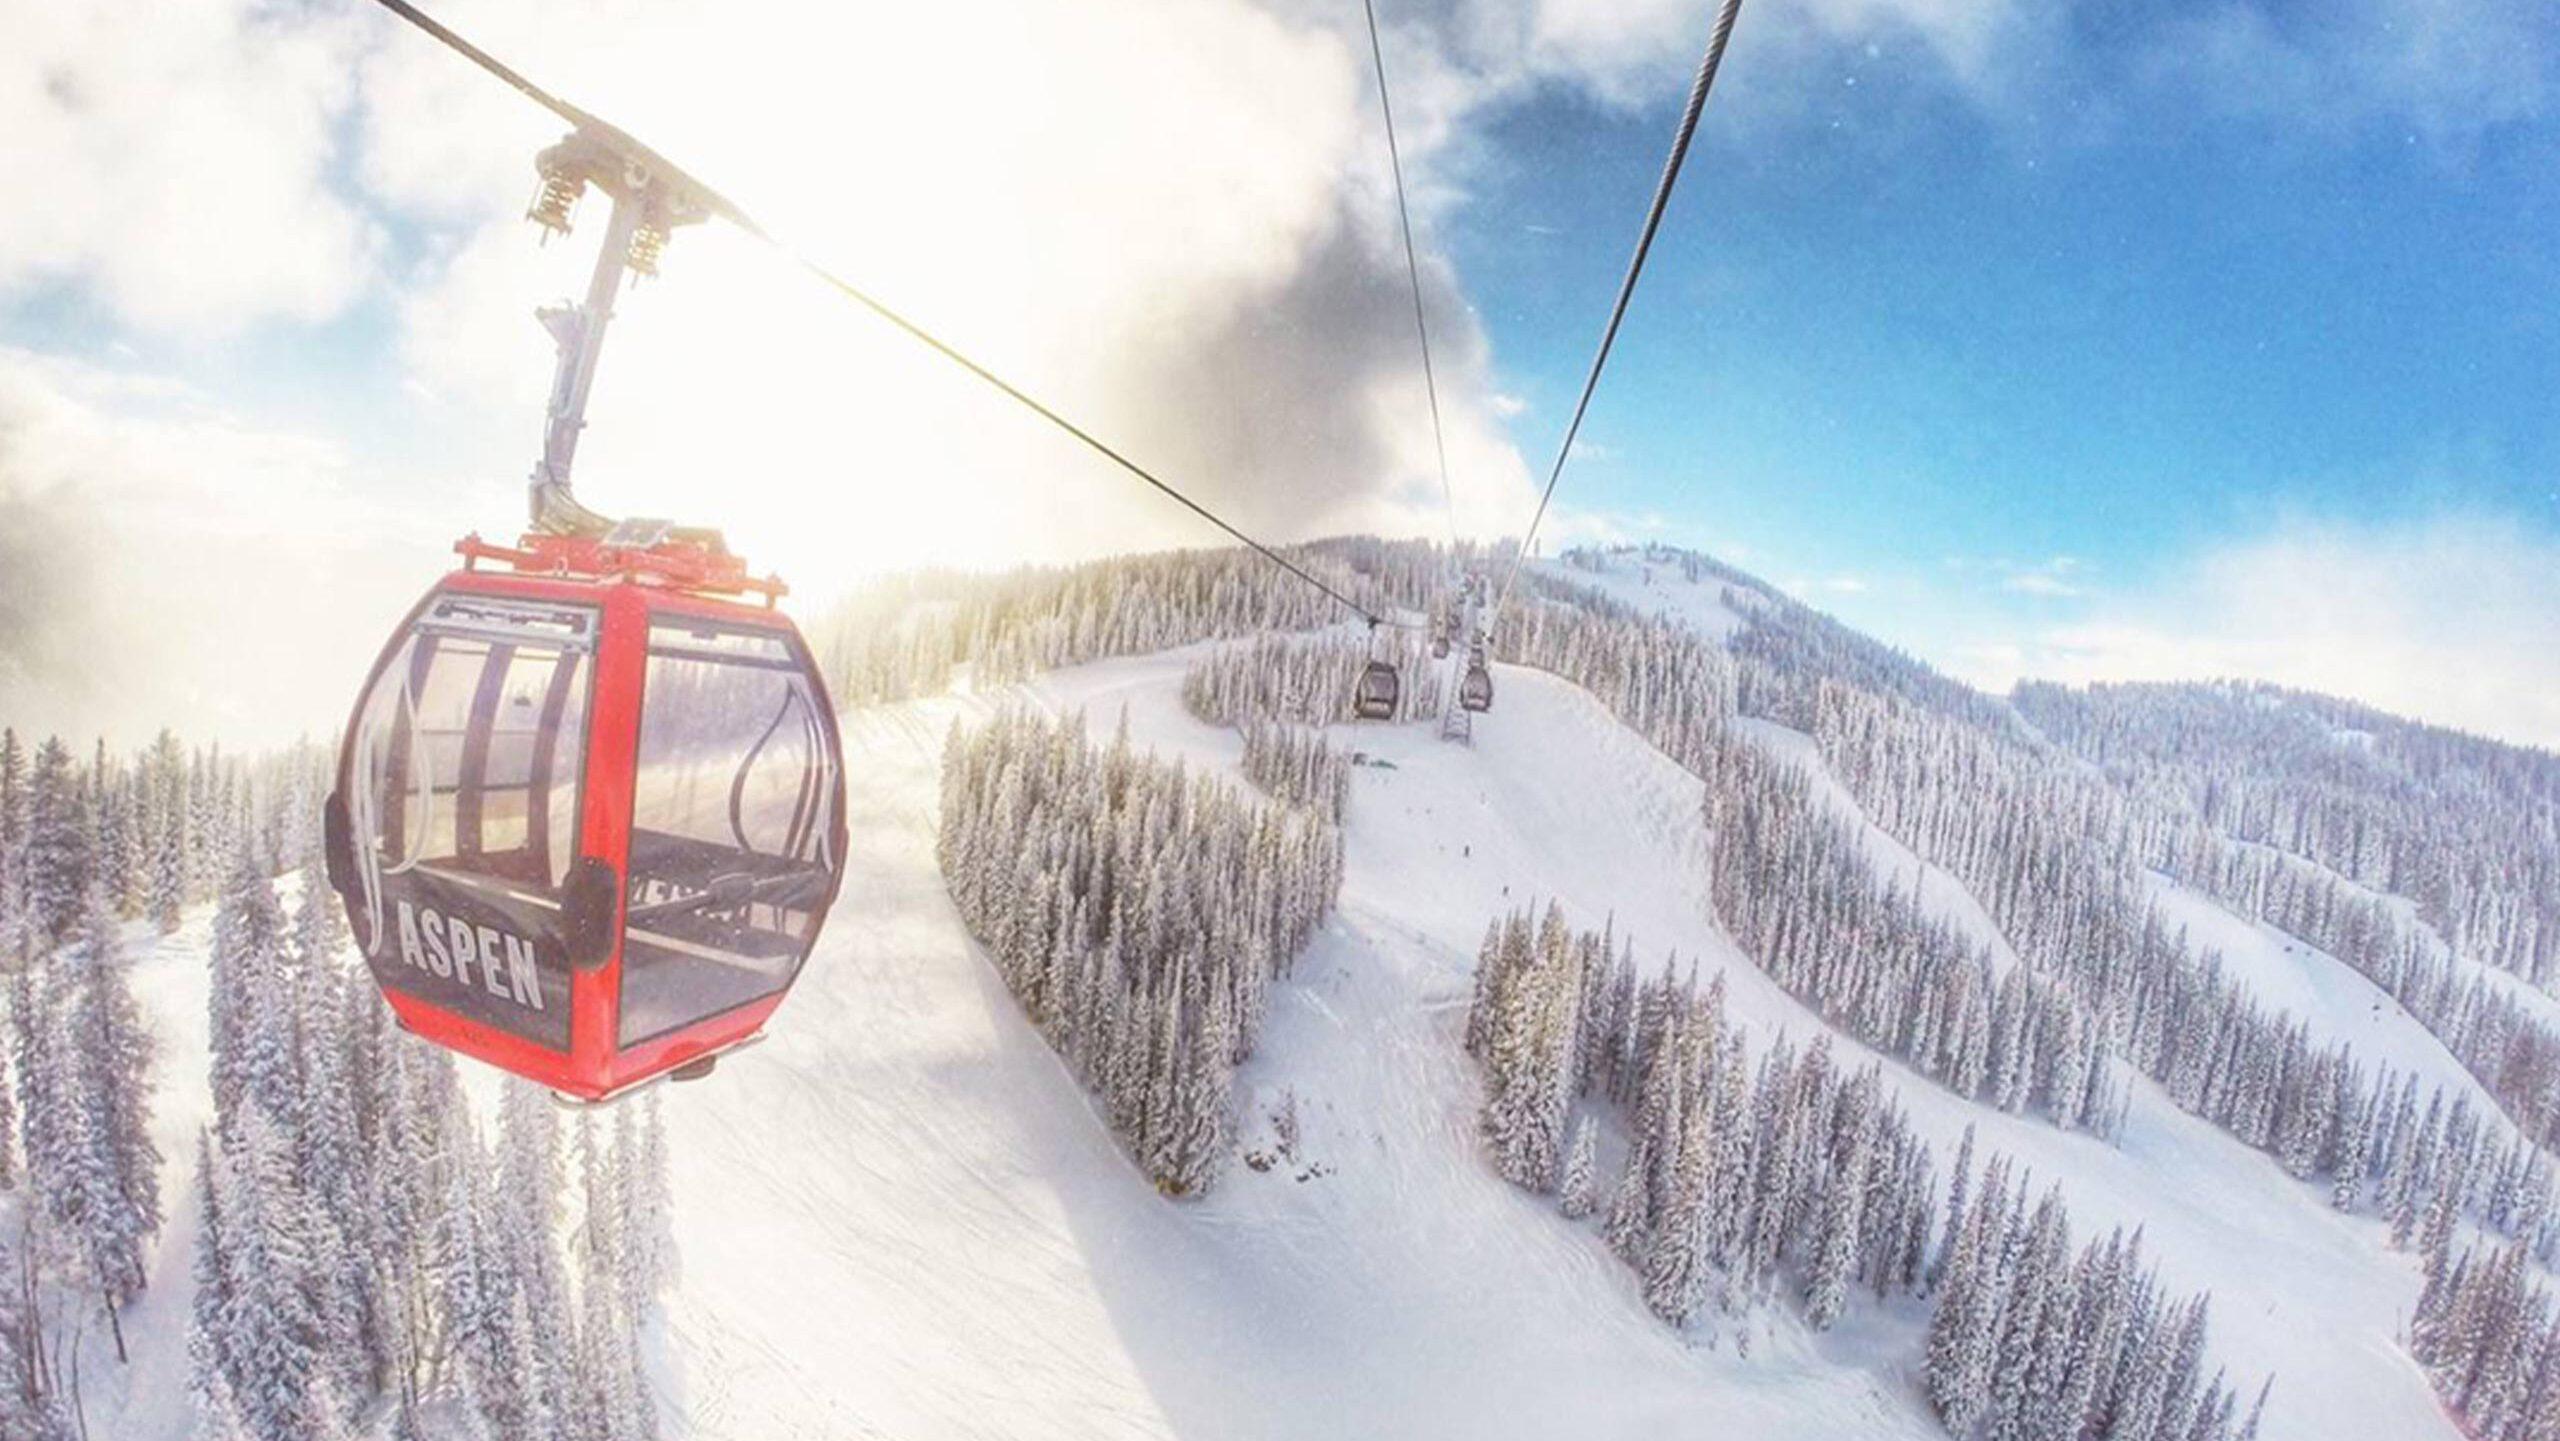 Wintertime experiences in Aspen